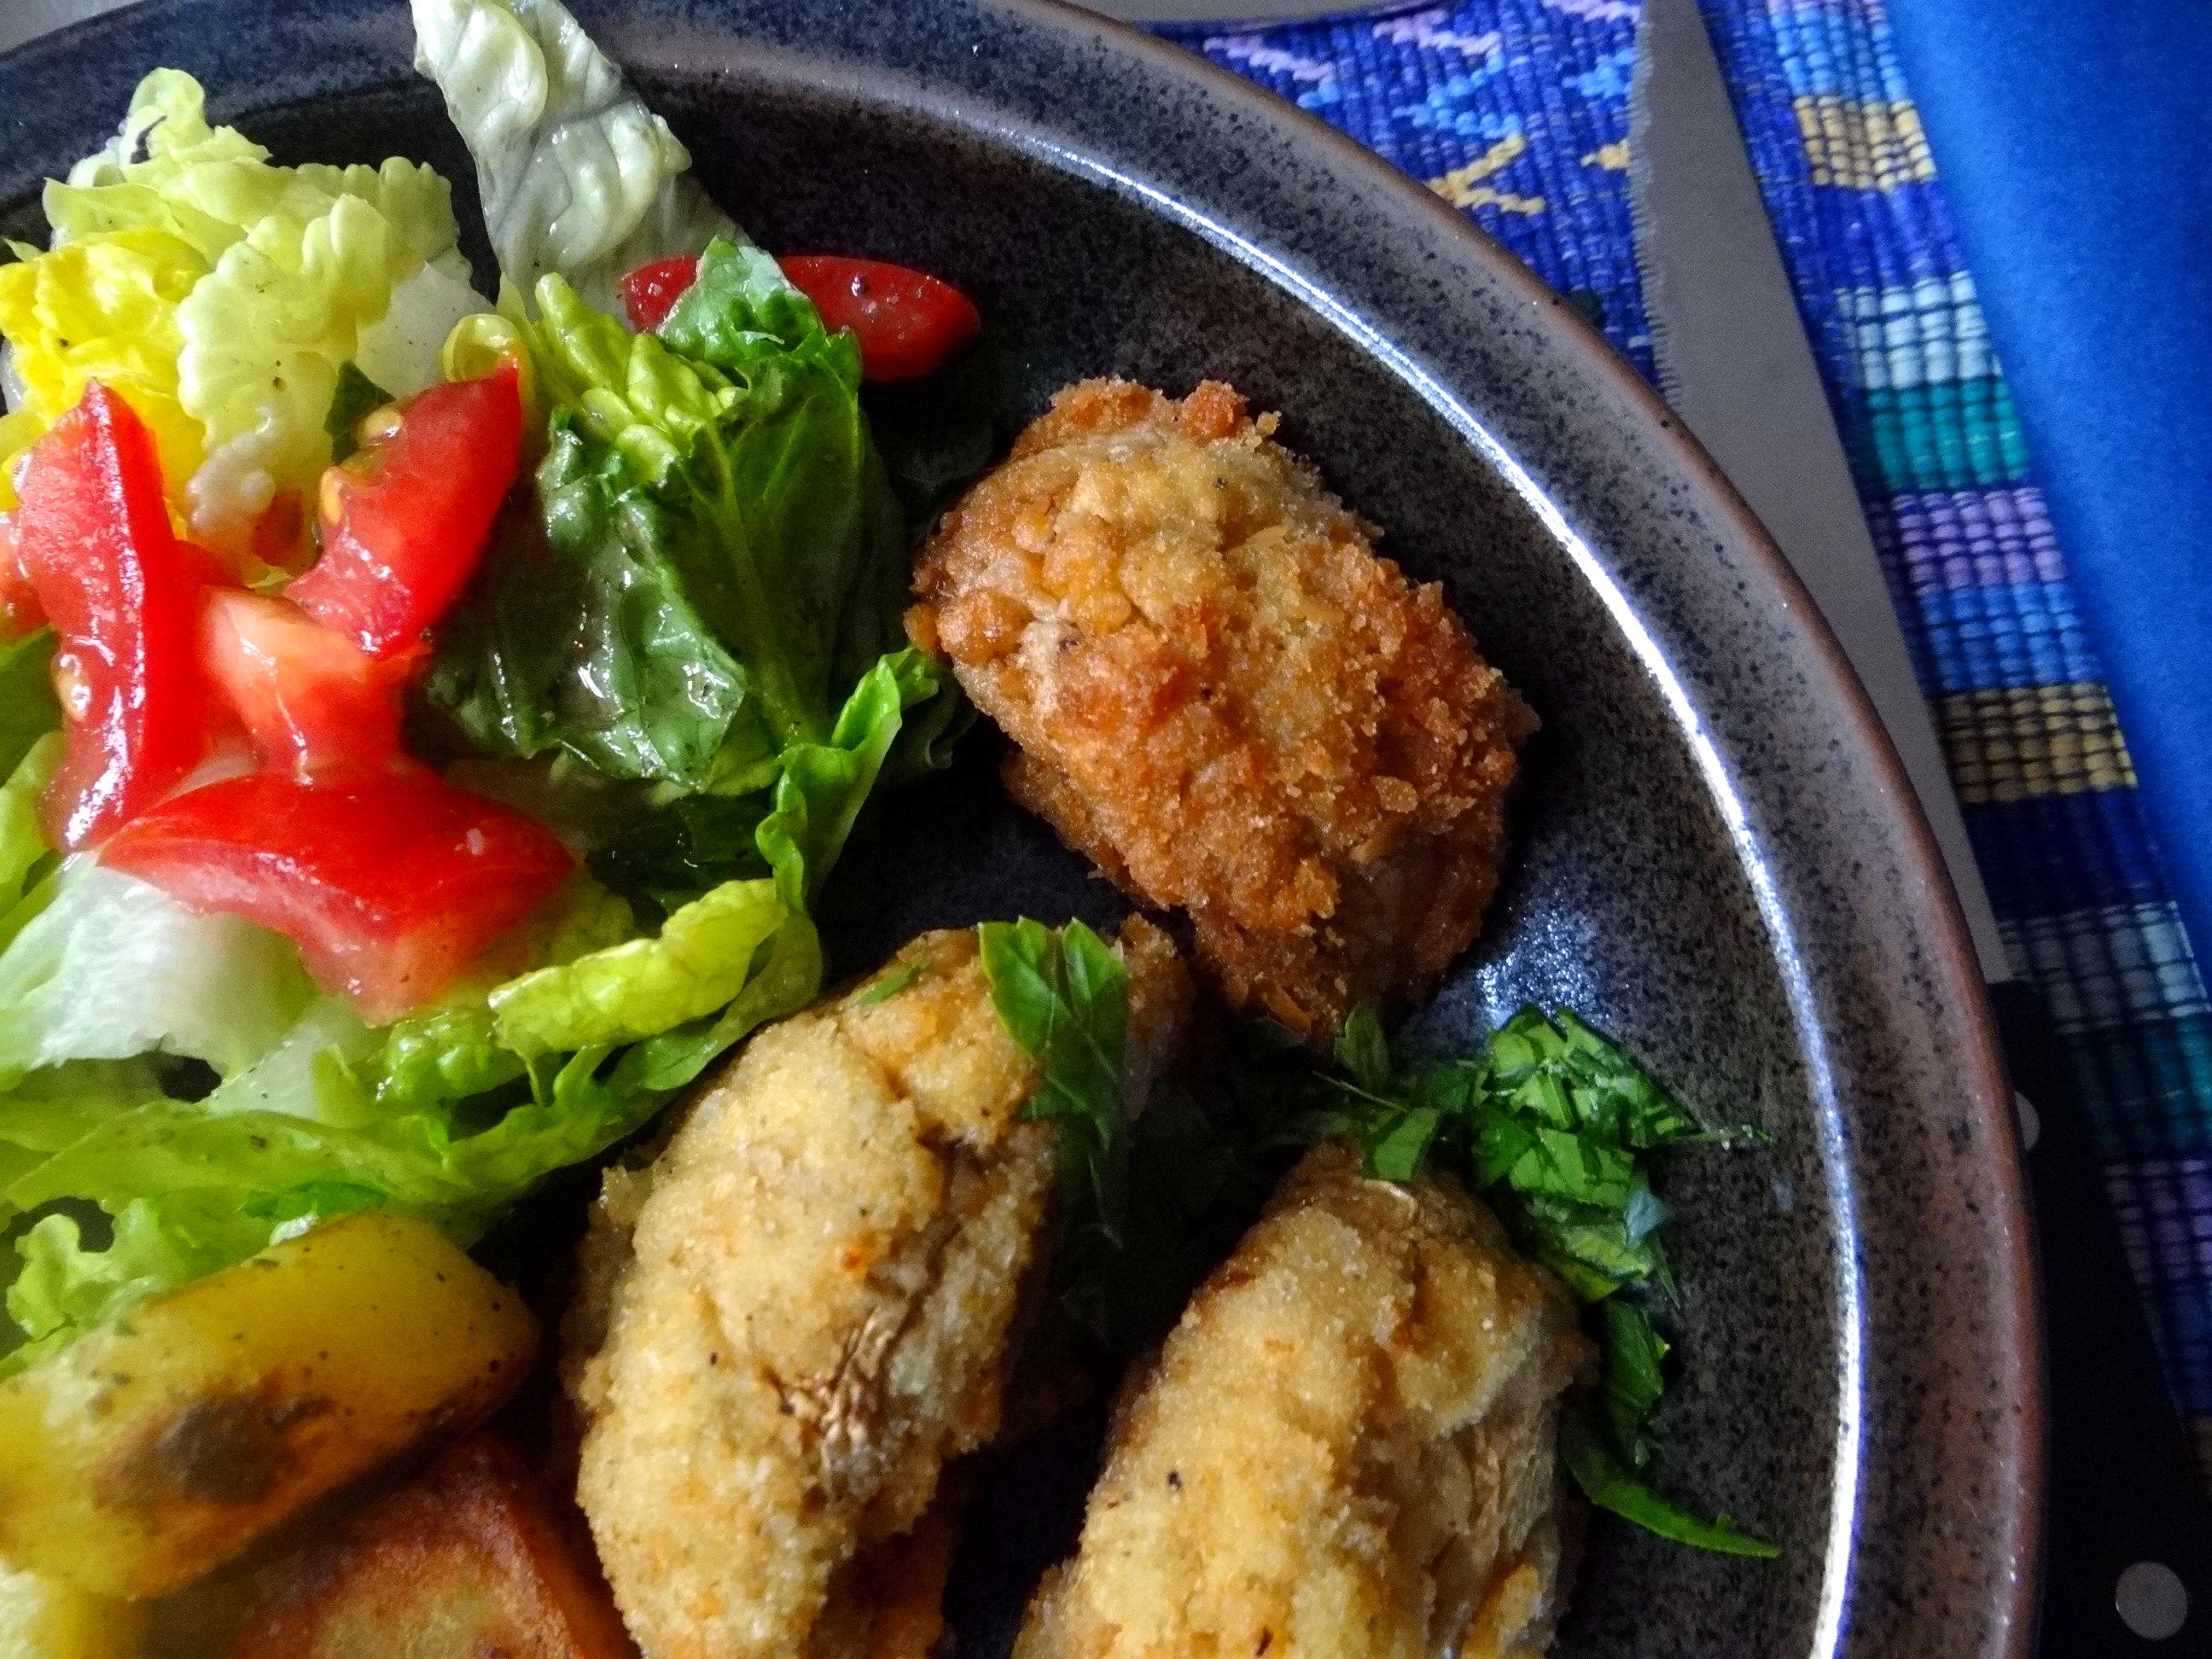 Fritierte Portobello,Bratkartoffeln,Pimientos,Salat,vegan (20)